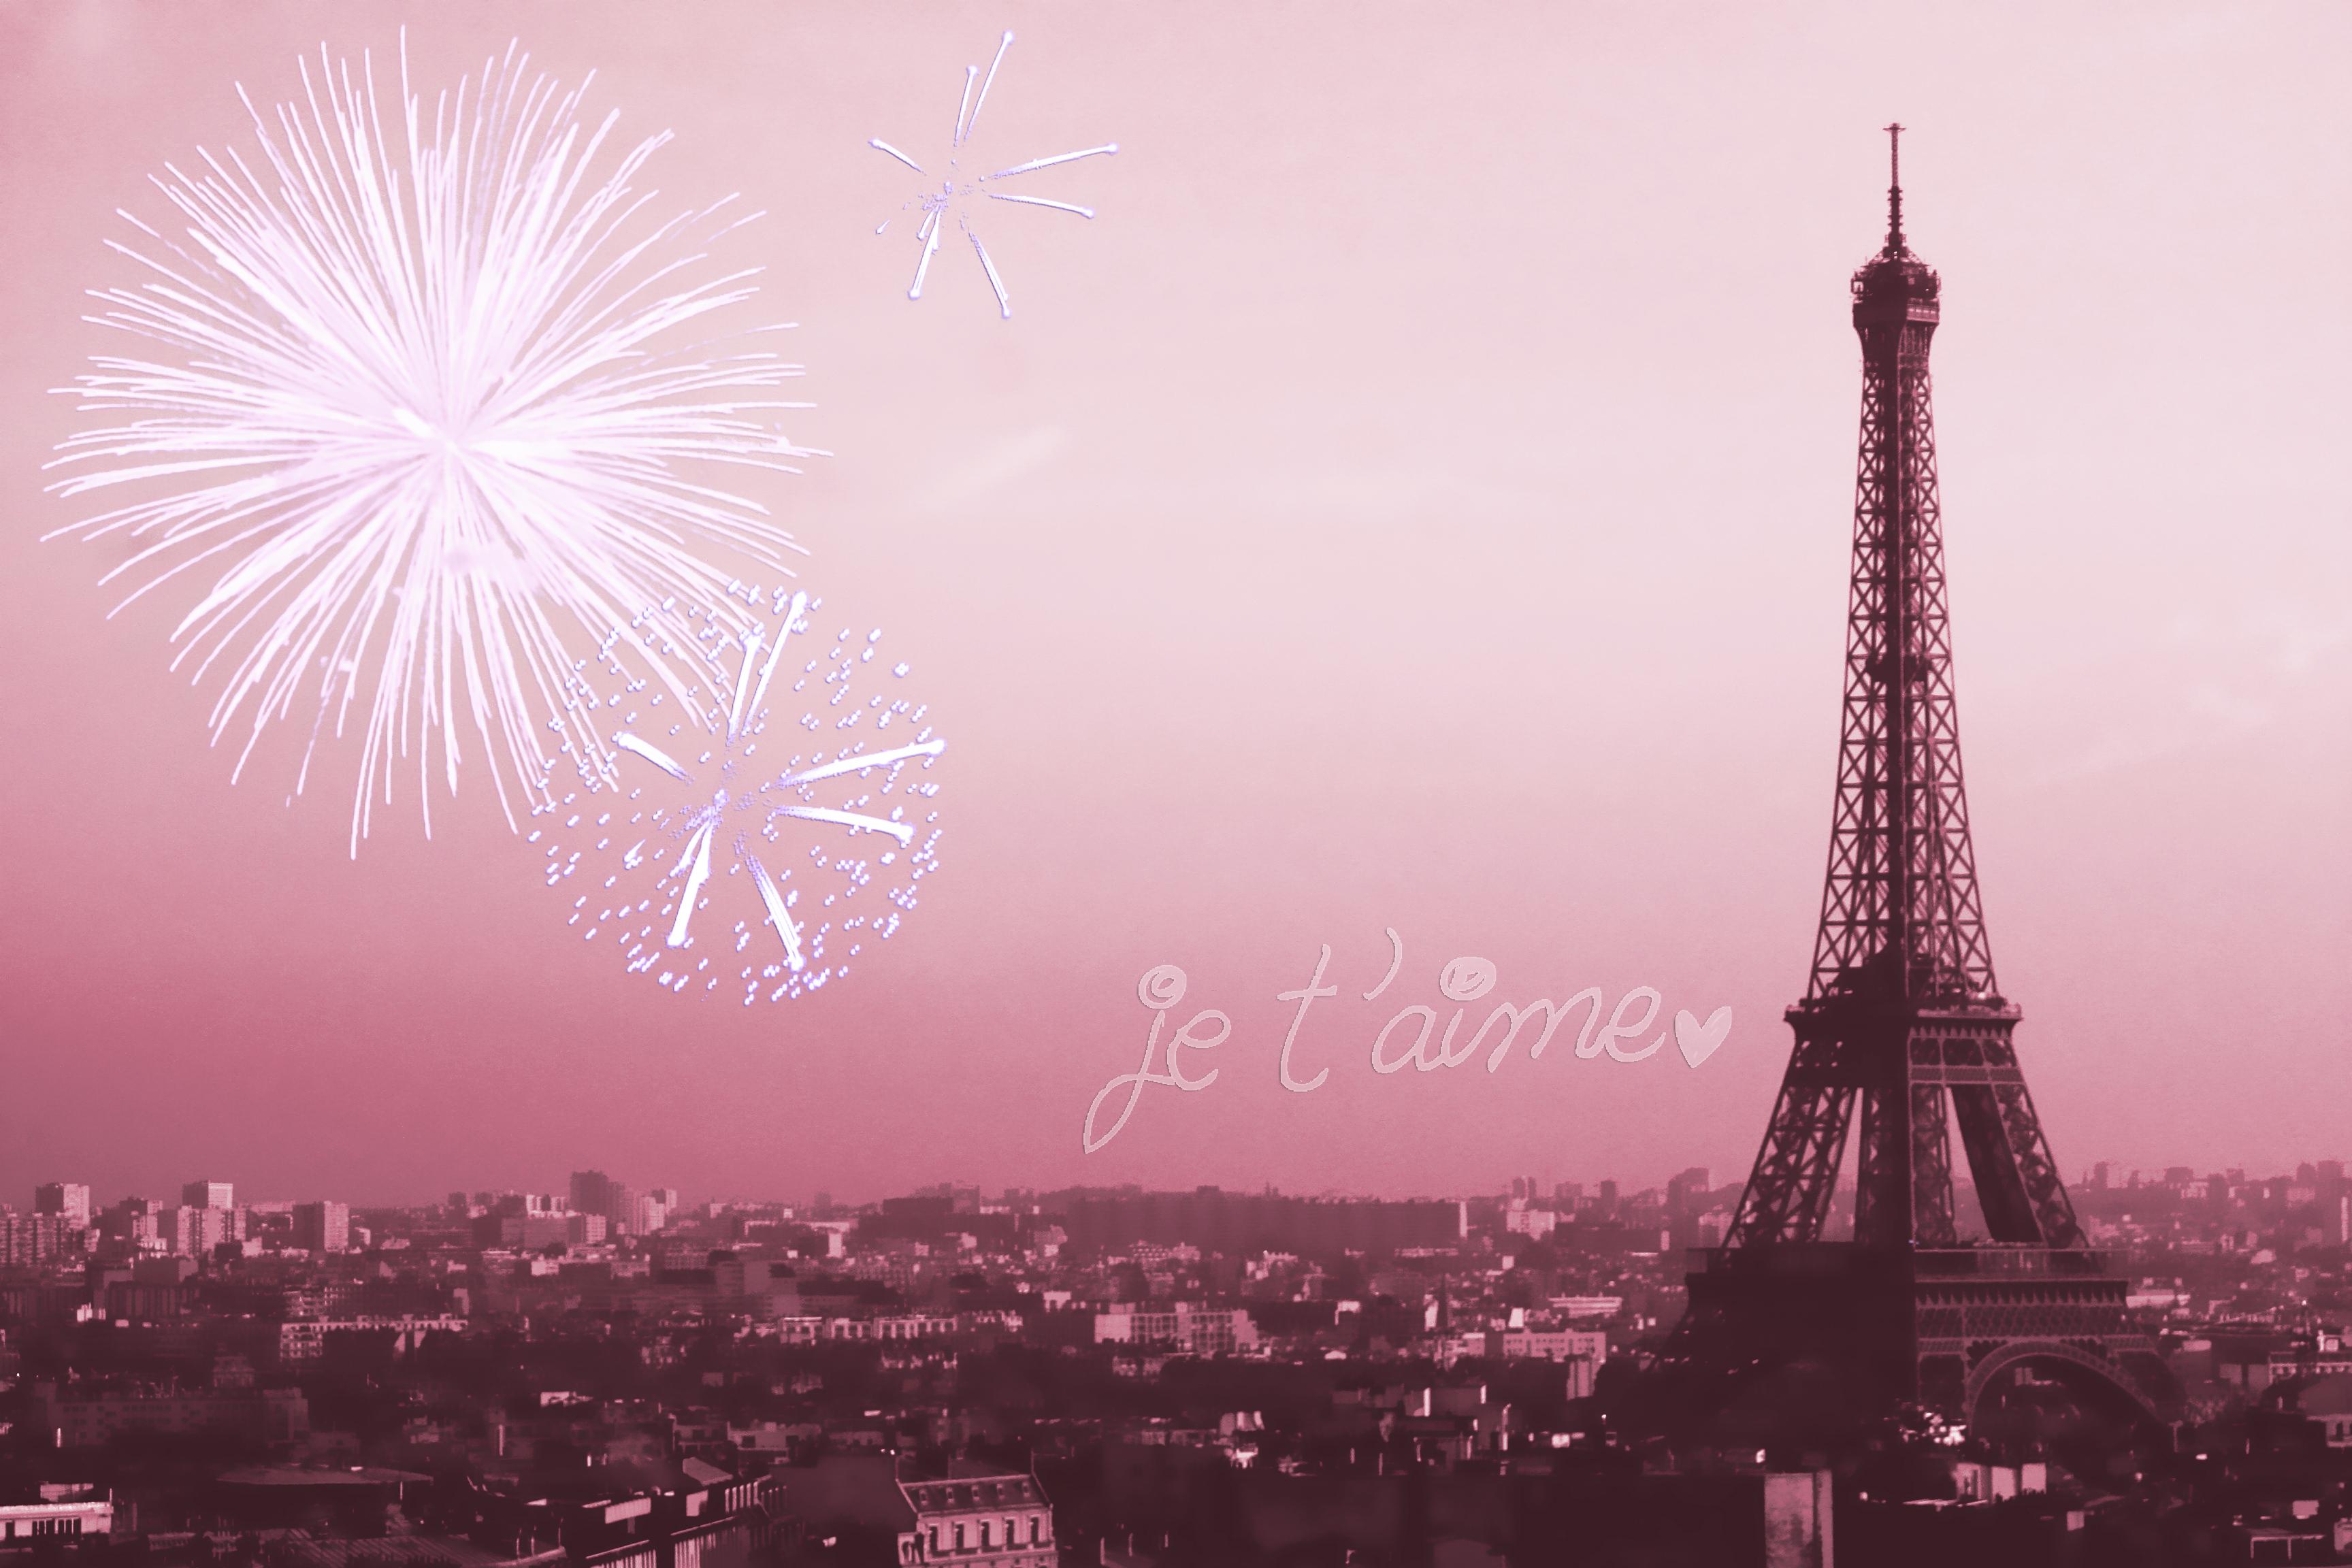 30 Paris Wallpapers The Romance Beneath The City Lights 3456x2304